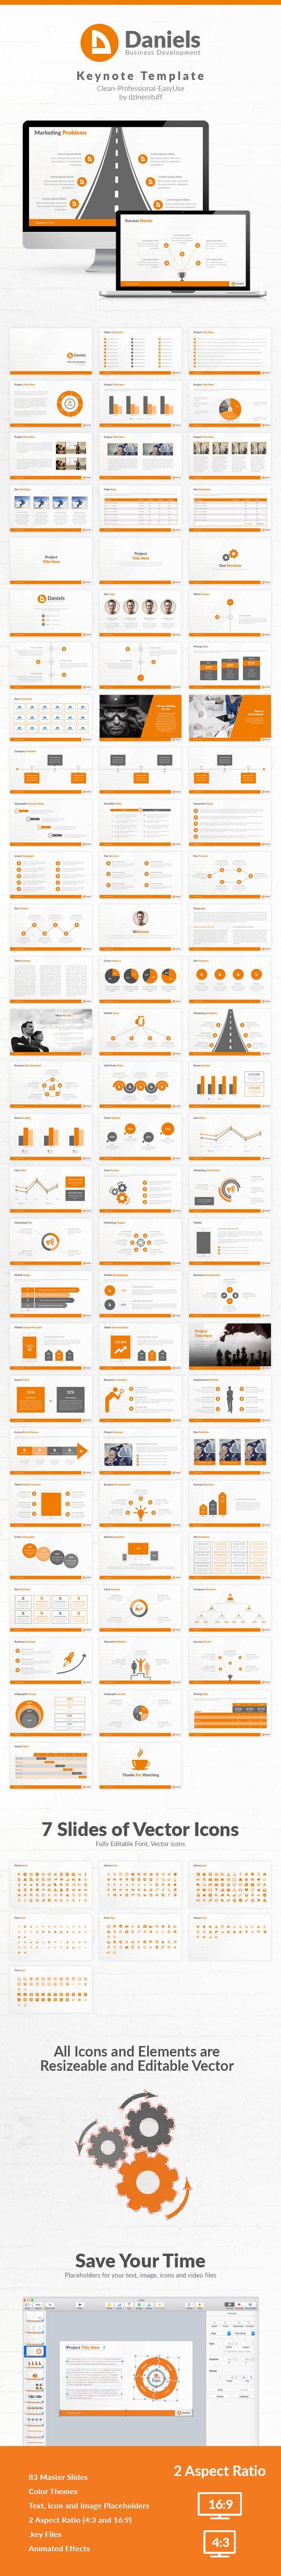 Daniels Keynote Presentation Template #design Download: http://graphicriver.net/item/daniels-keynote-presentation-template/11770699?ref=ksioks